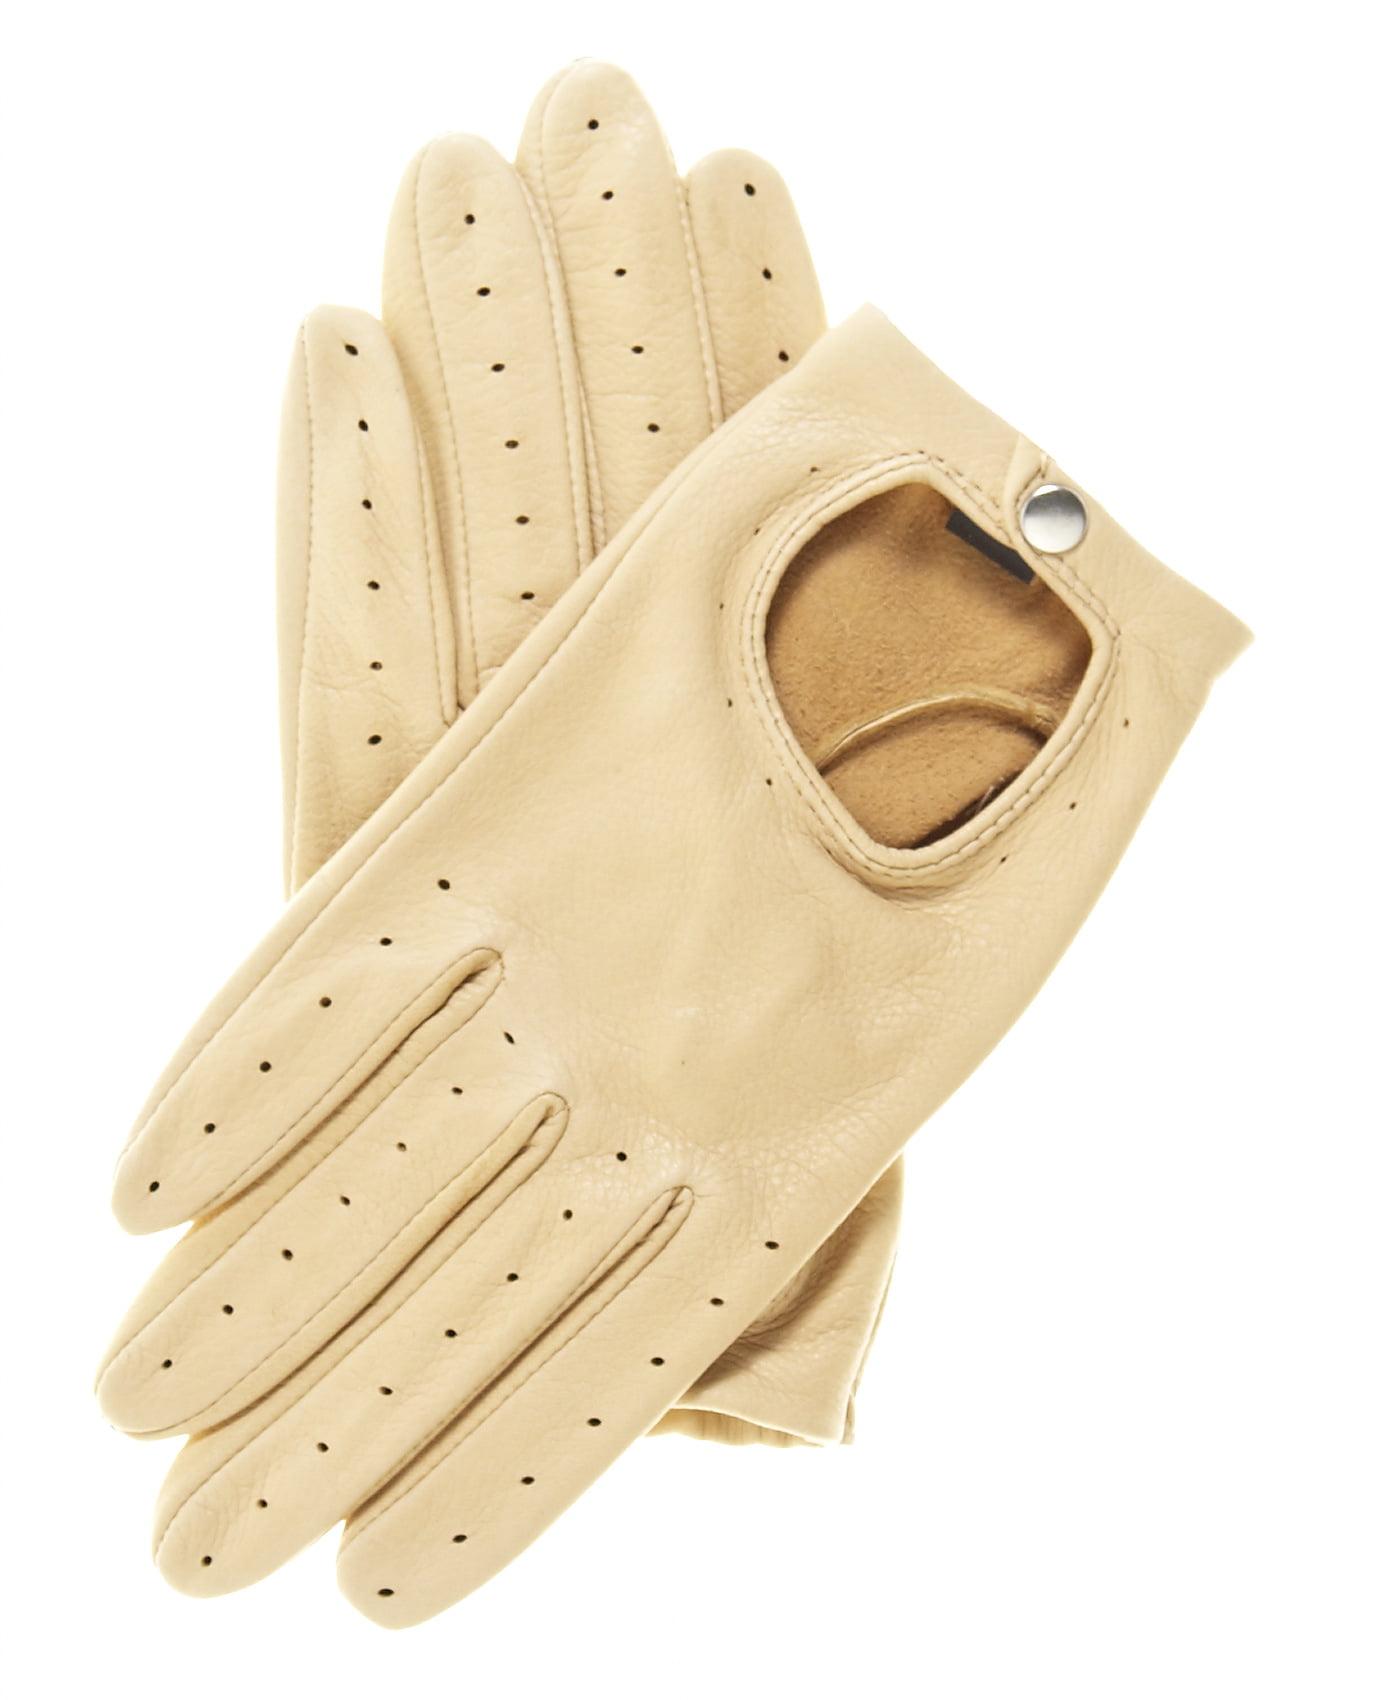 Driving gloves at walmart - Pratt And Hart Women S Deerskin Leather Driving Gloves